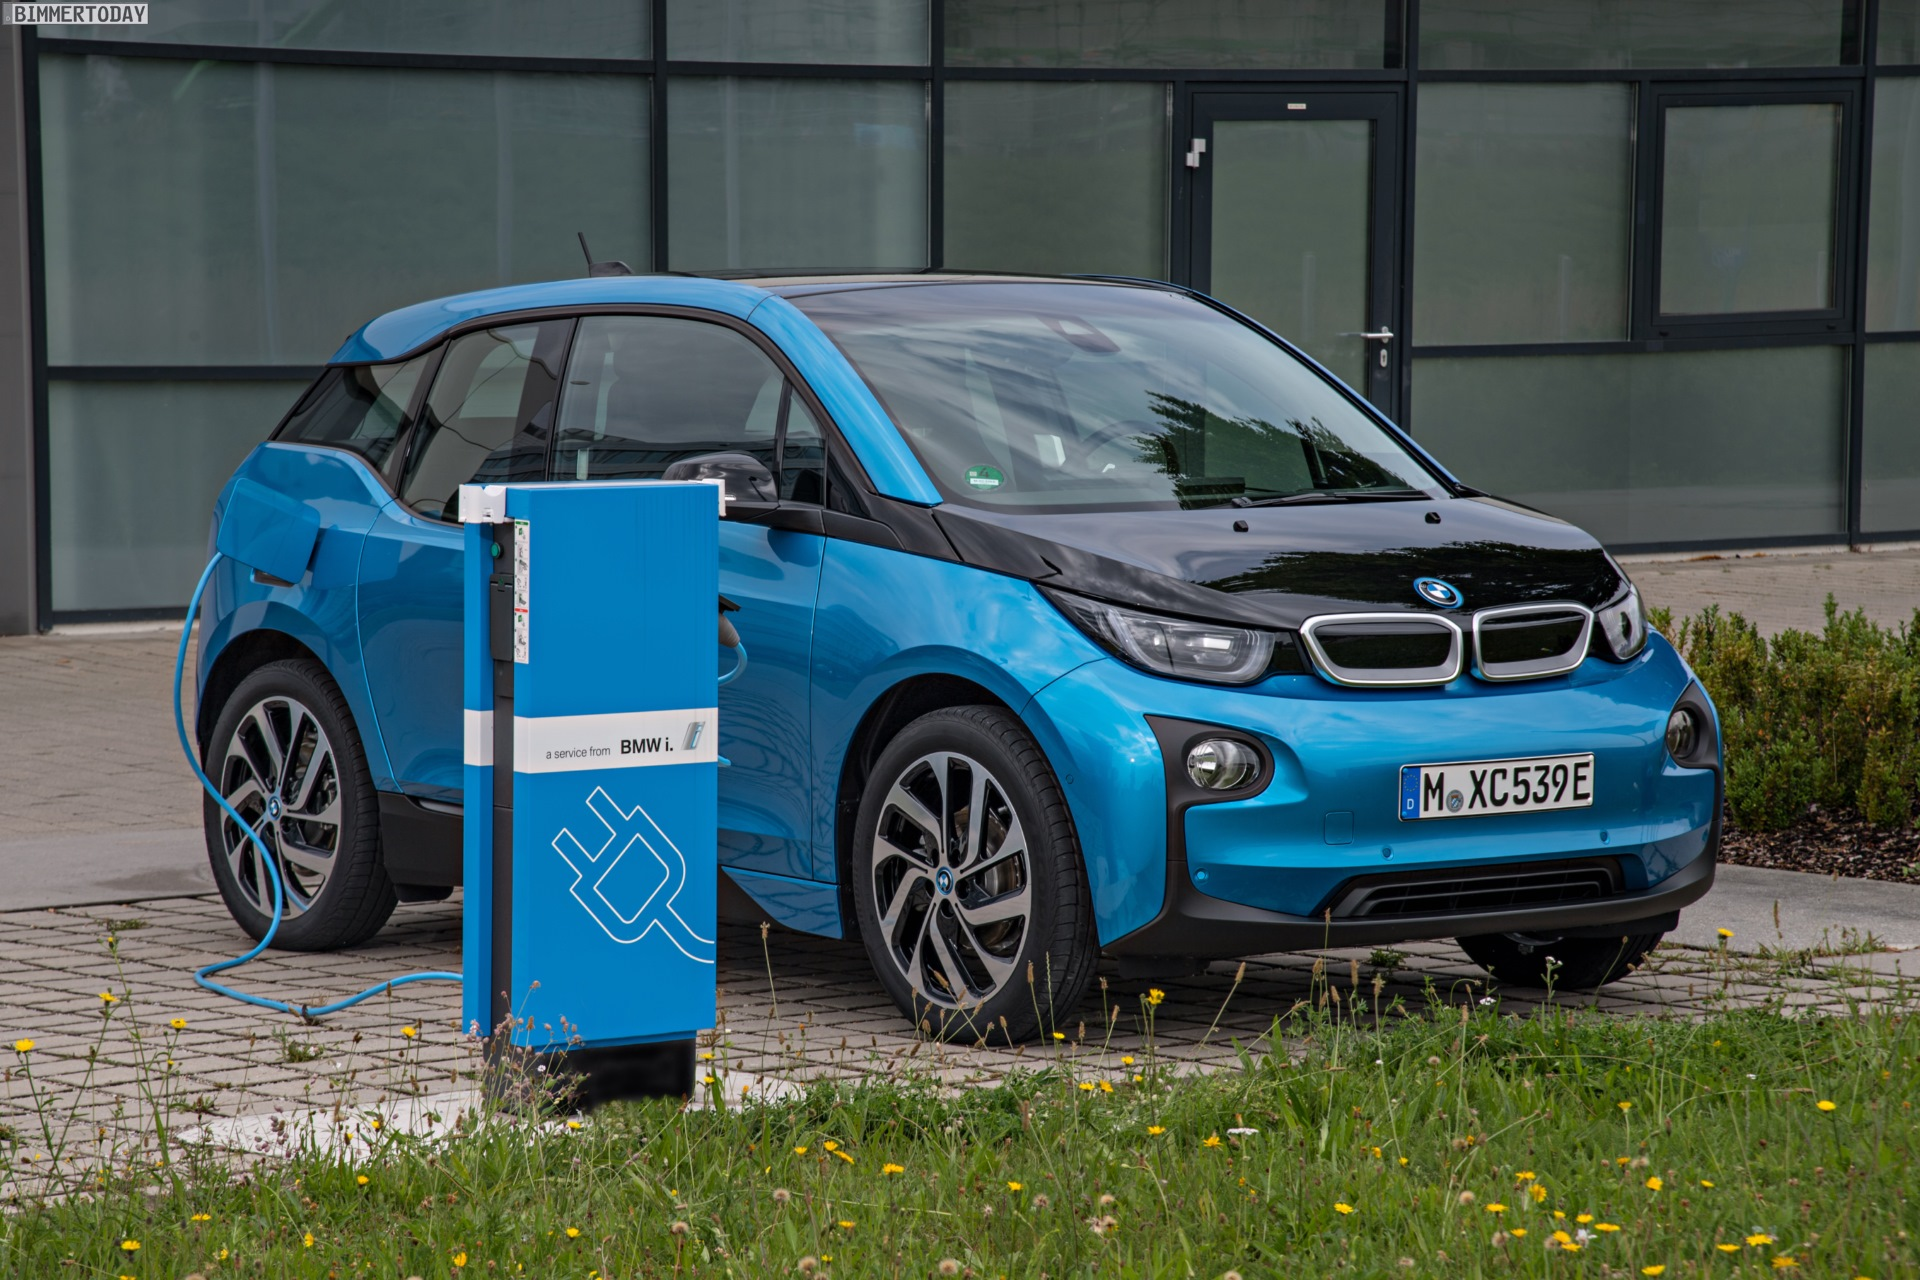 2016 BMW i3 94Ah Protonic Blue 33 kWh Elektroauto 24